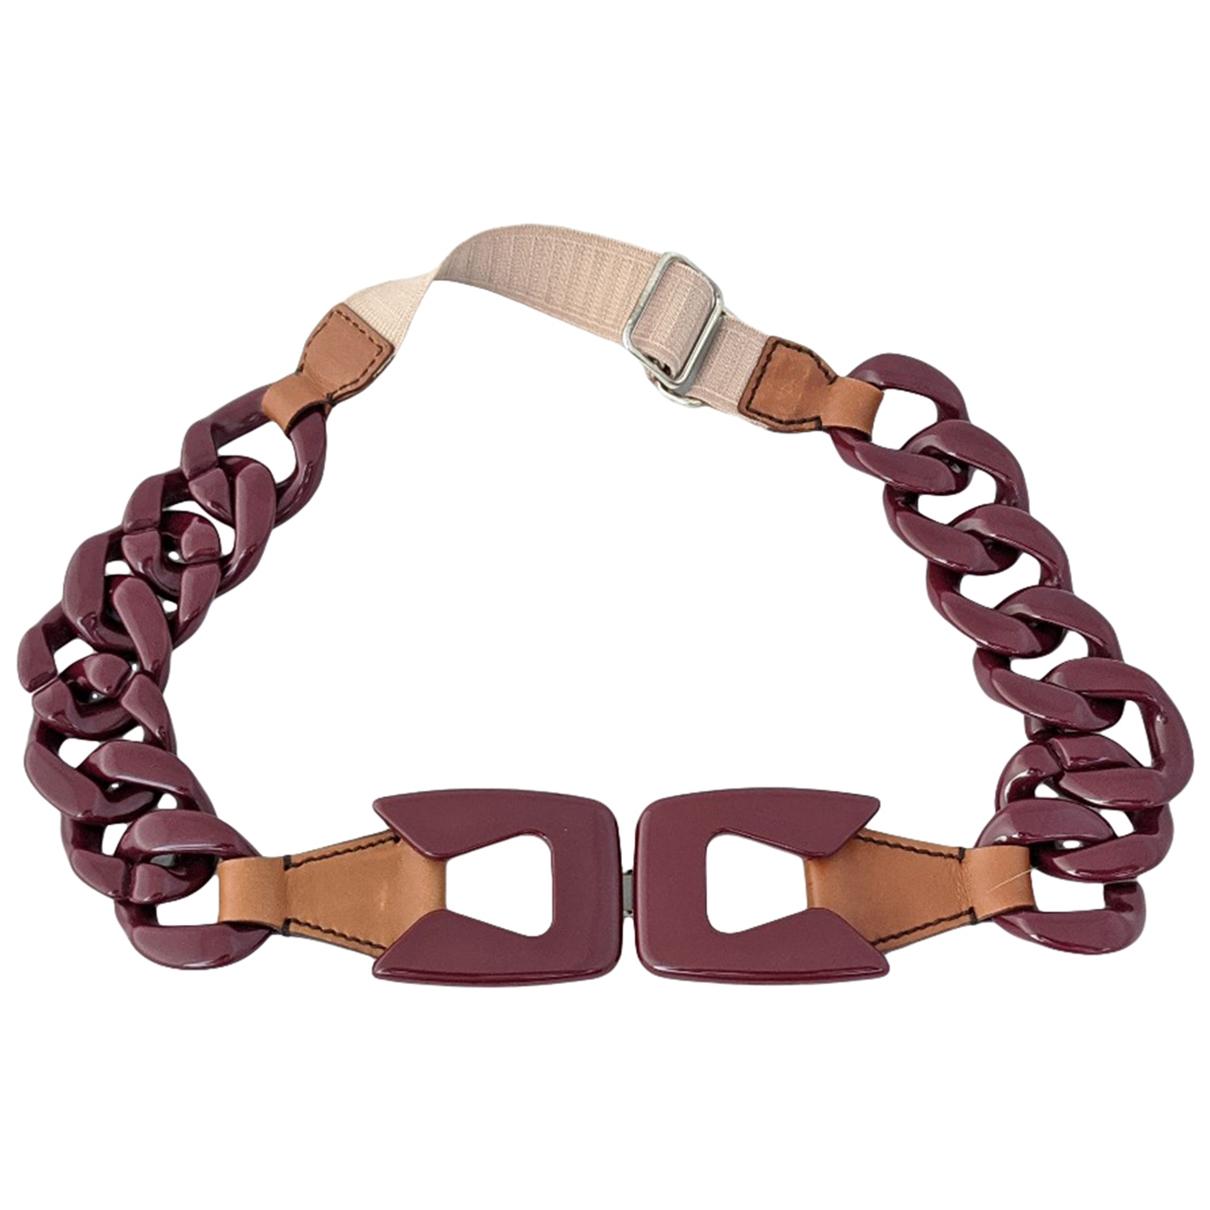 Prada \N Burgundy Leather belt for Women 75 cm